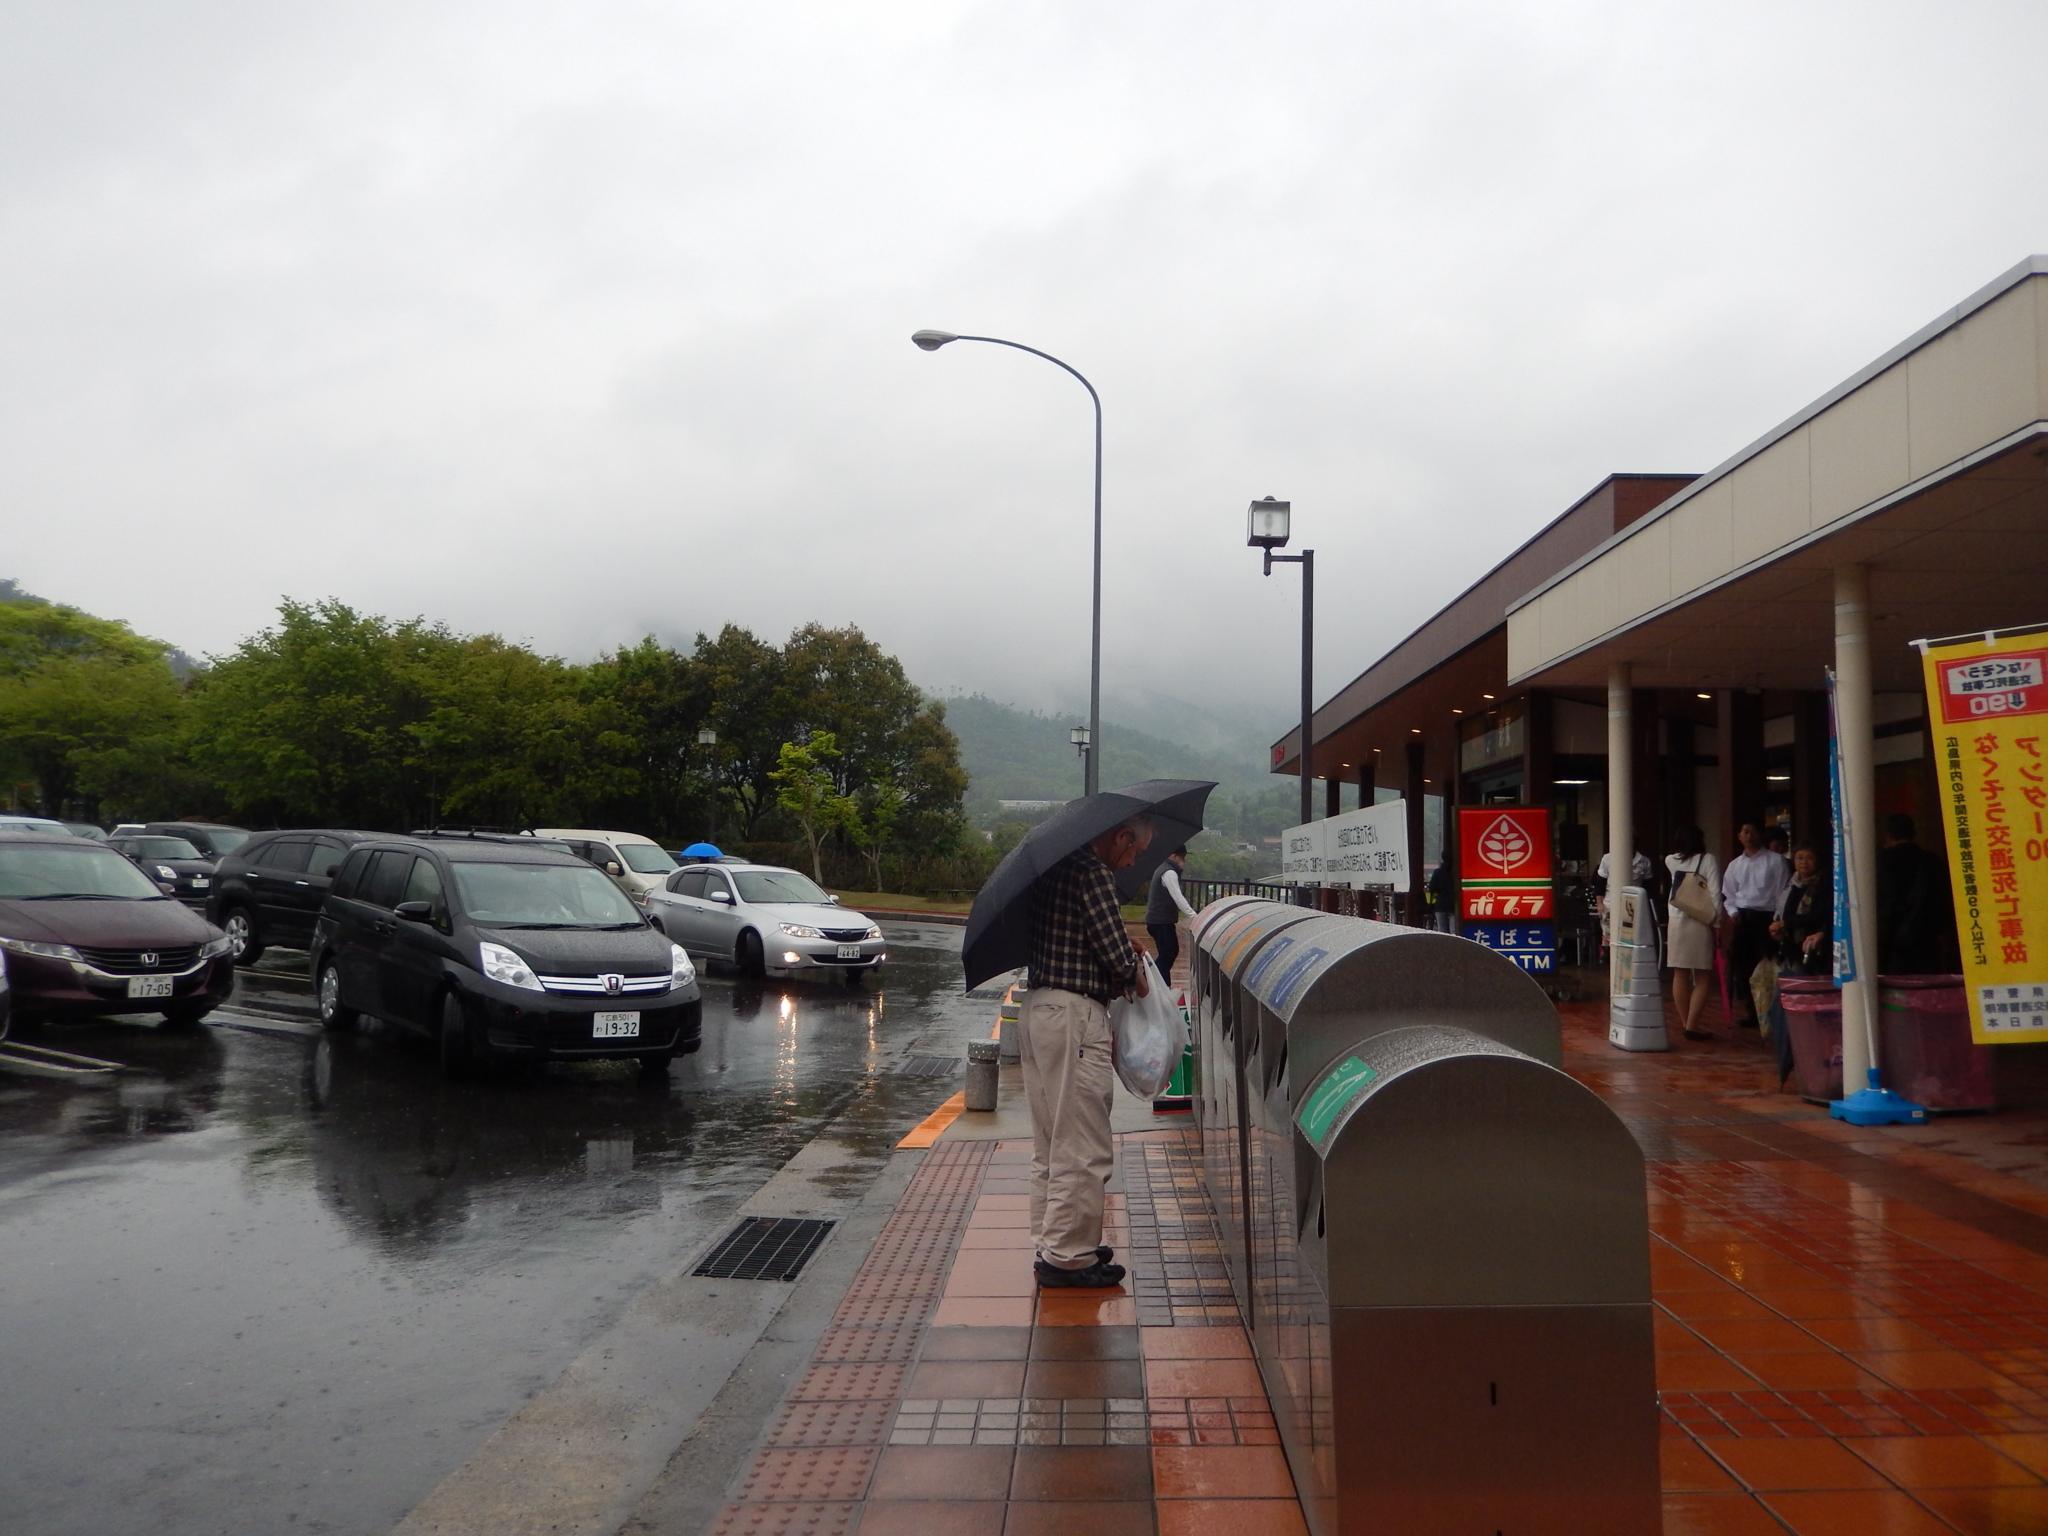 f:id:ToshUeno:20150503161051j:plain